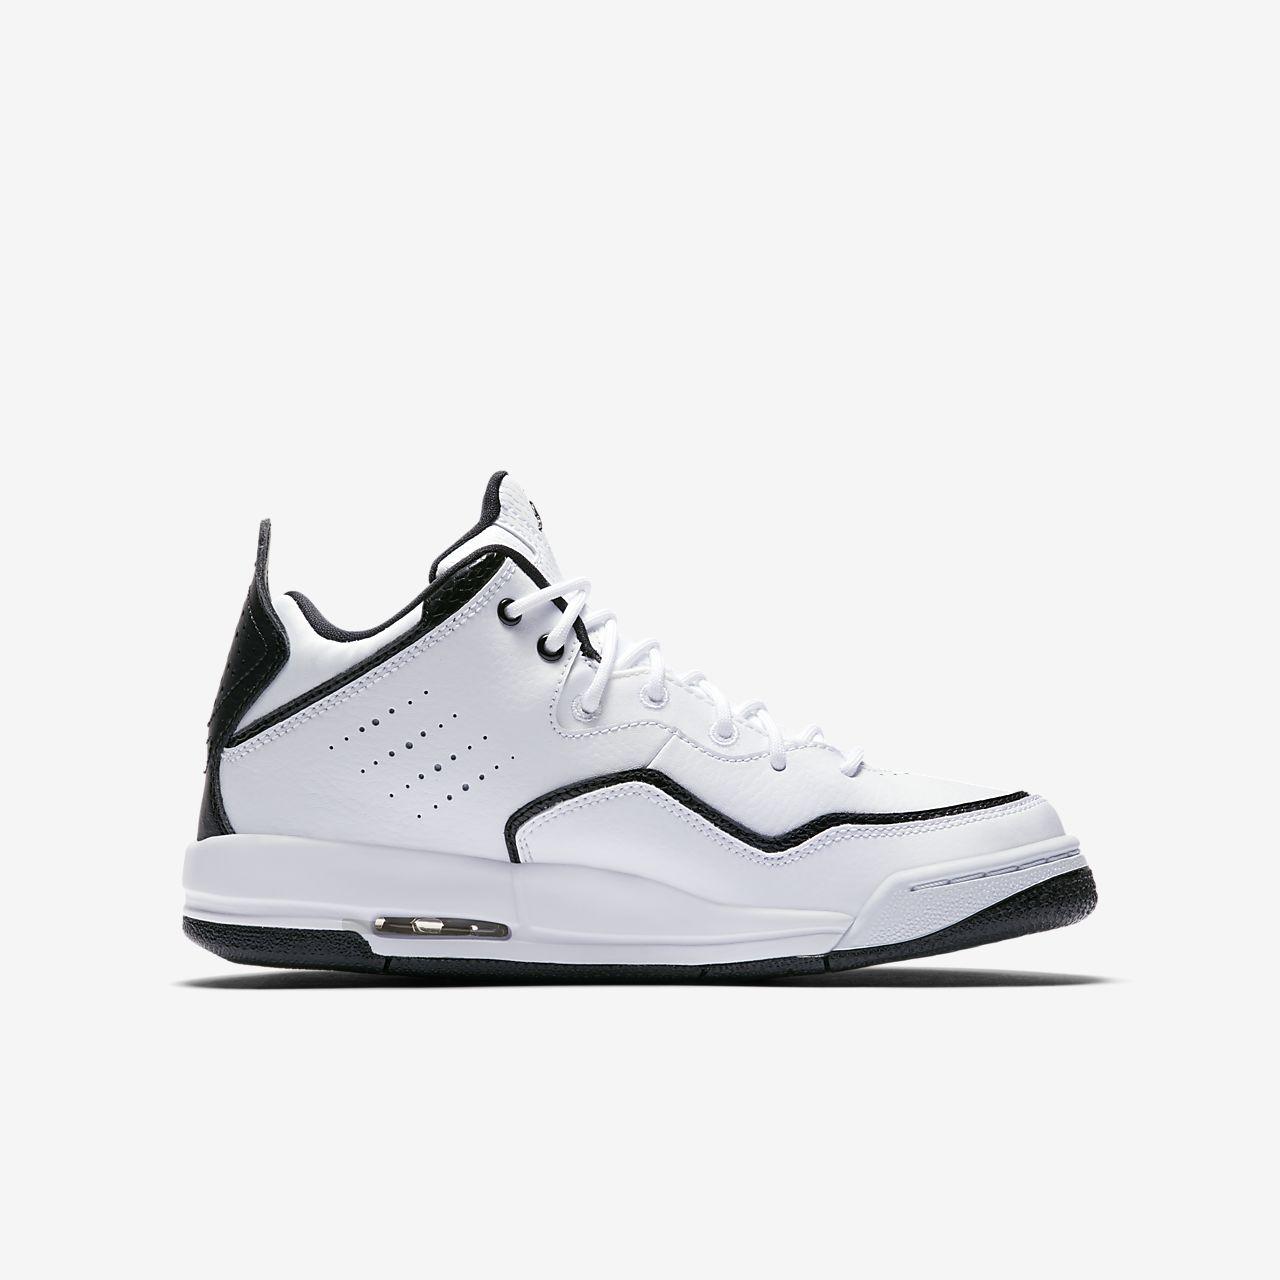 jordan courtside shoes